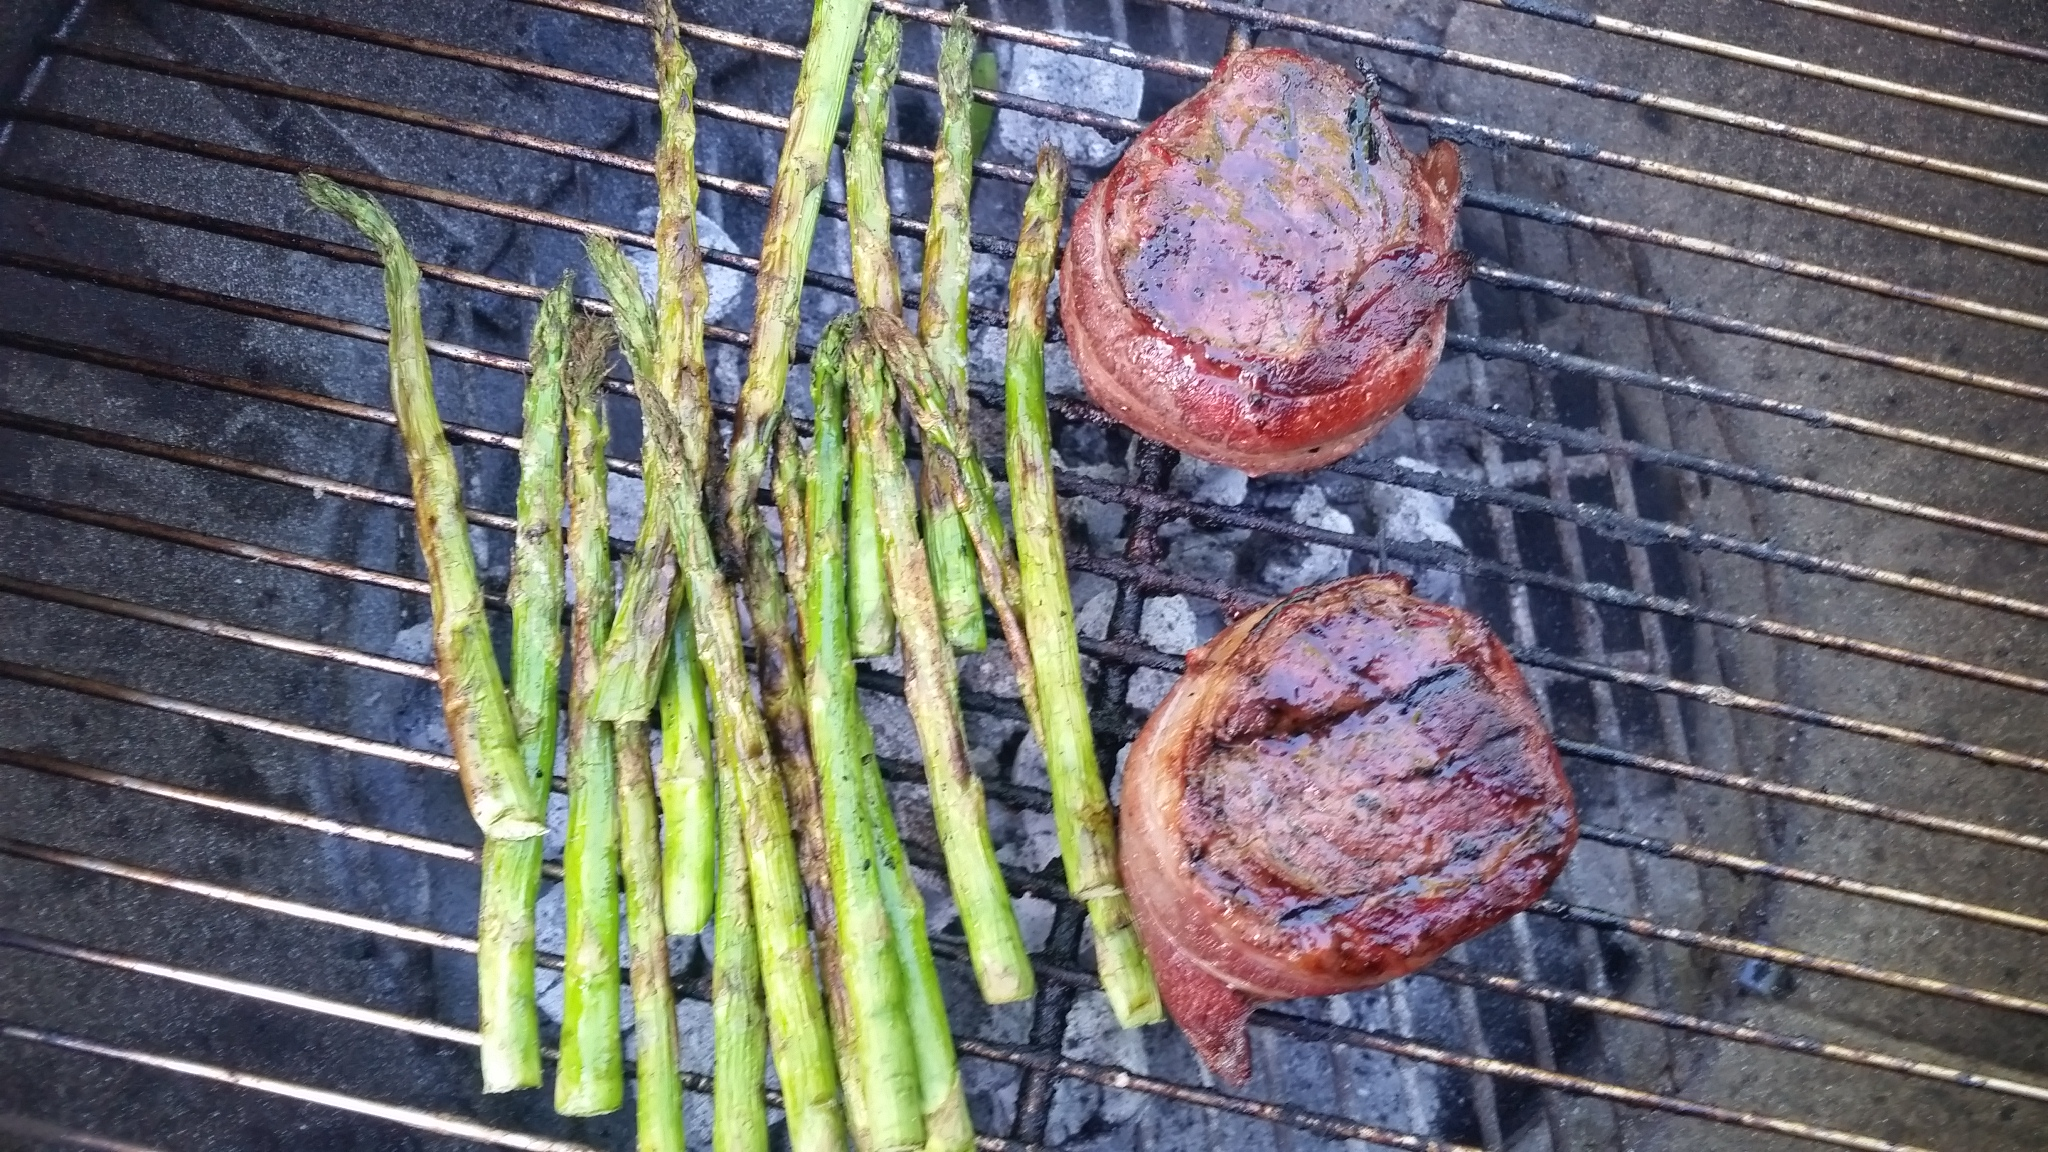 Do You Have a Backyard BBQ Grill?-steak.jpg